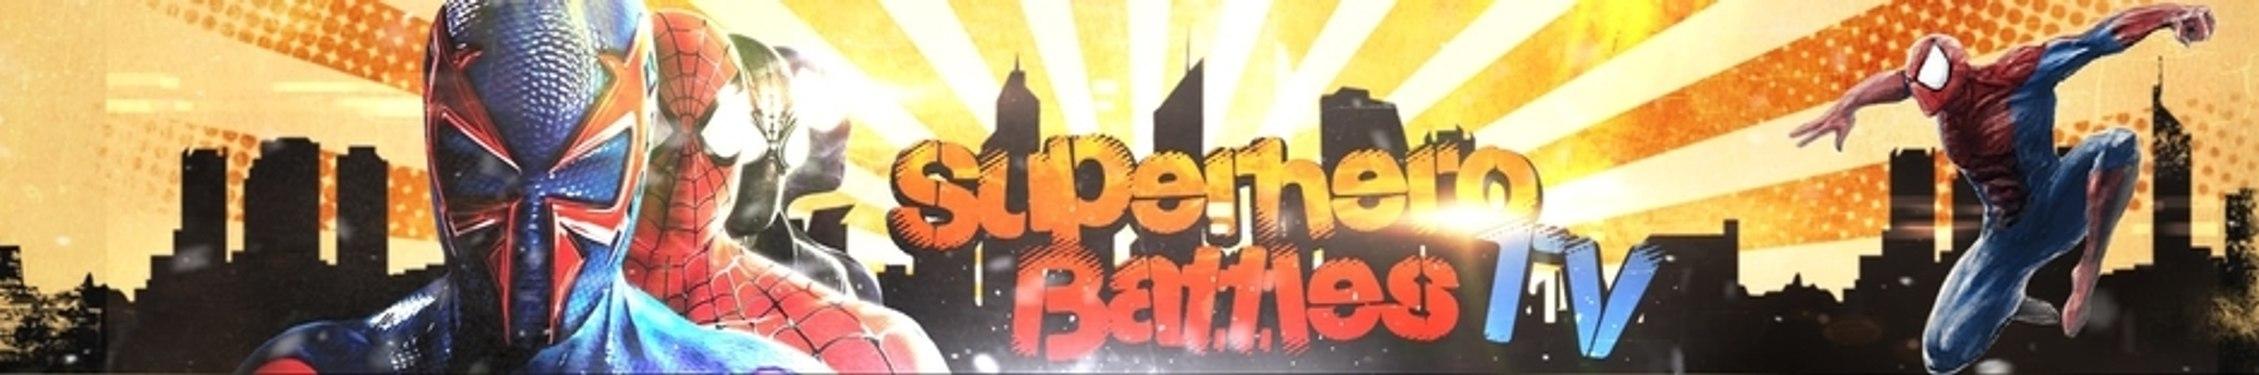 Superhero Battles TV